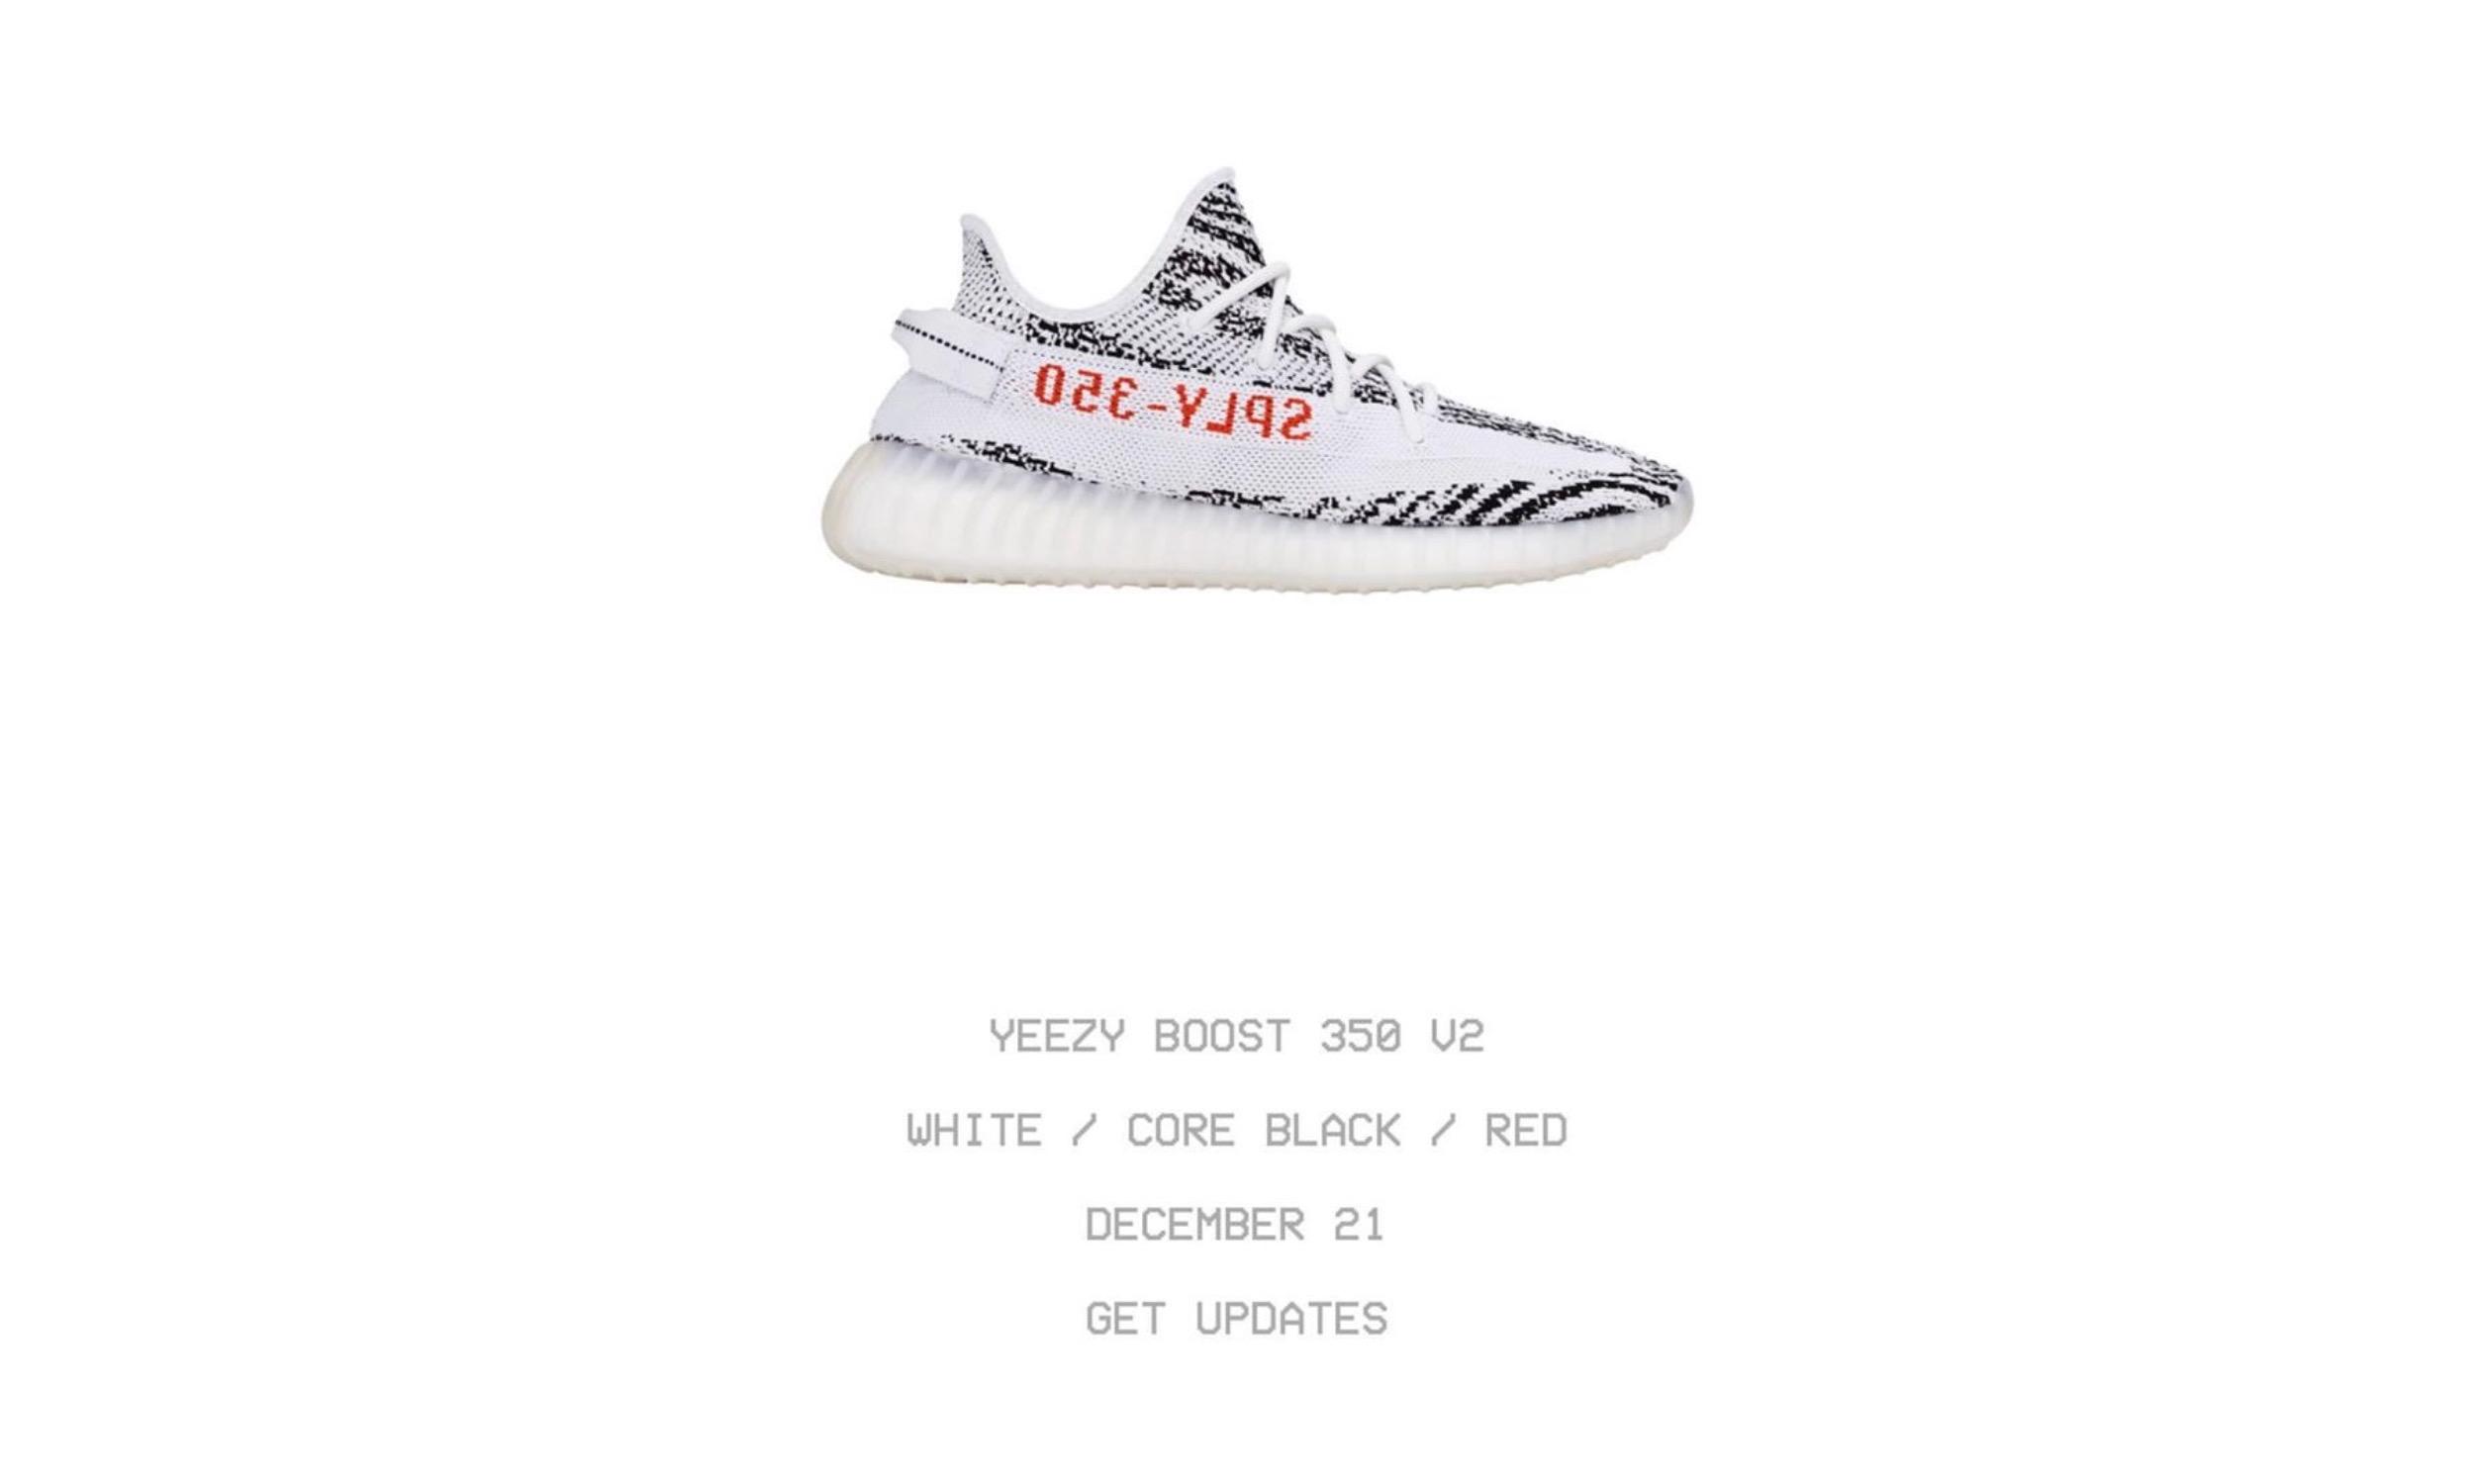 Yeezy Boost 350 V2「Zebra」补货日期确定